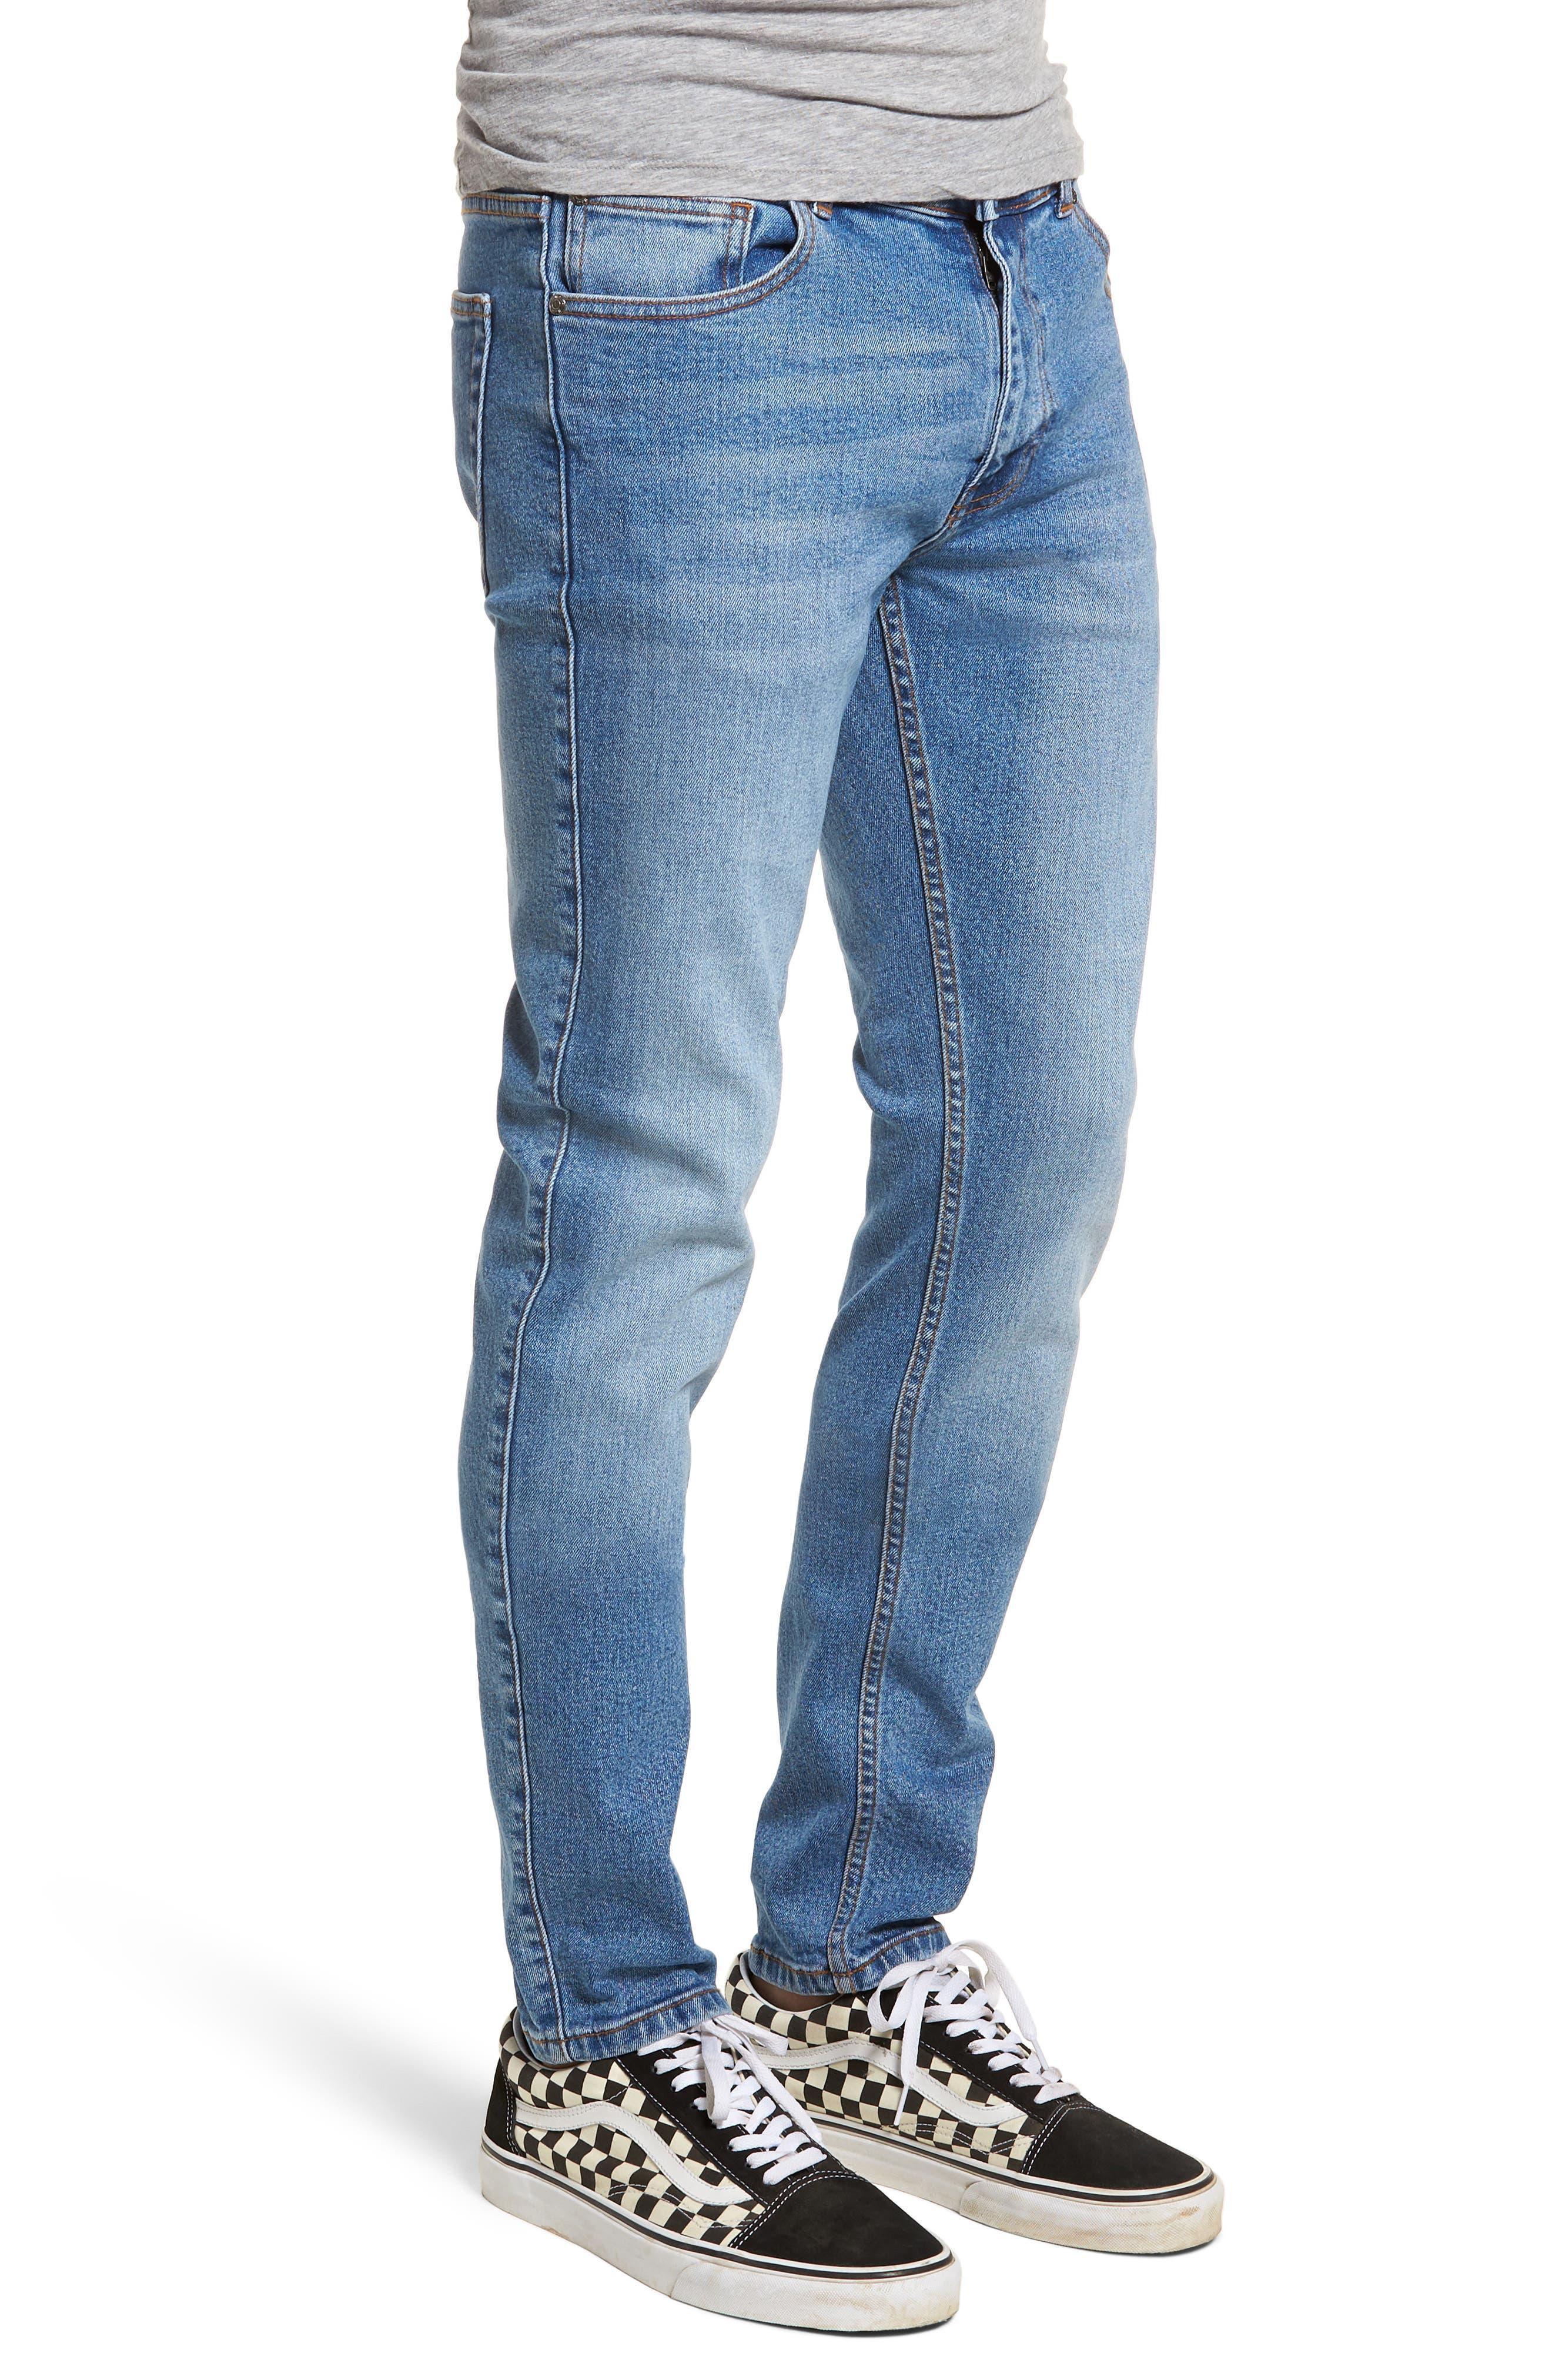 Clark Slim Straight Leg Jeans,                             Alternate thumbnail 3, color,                             Shaded Mid Blue